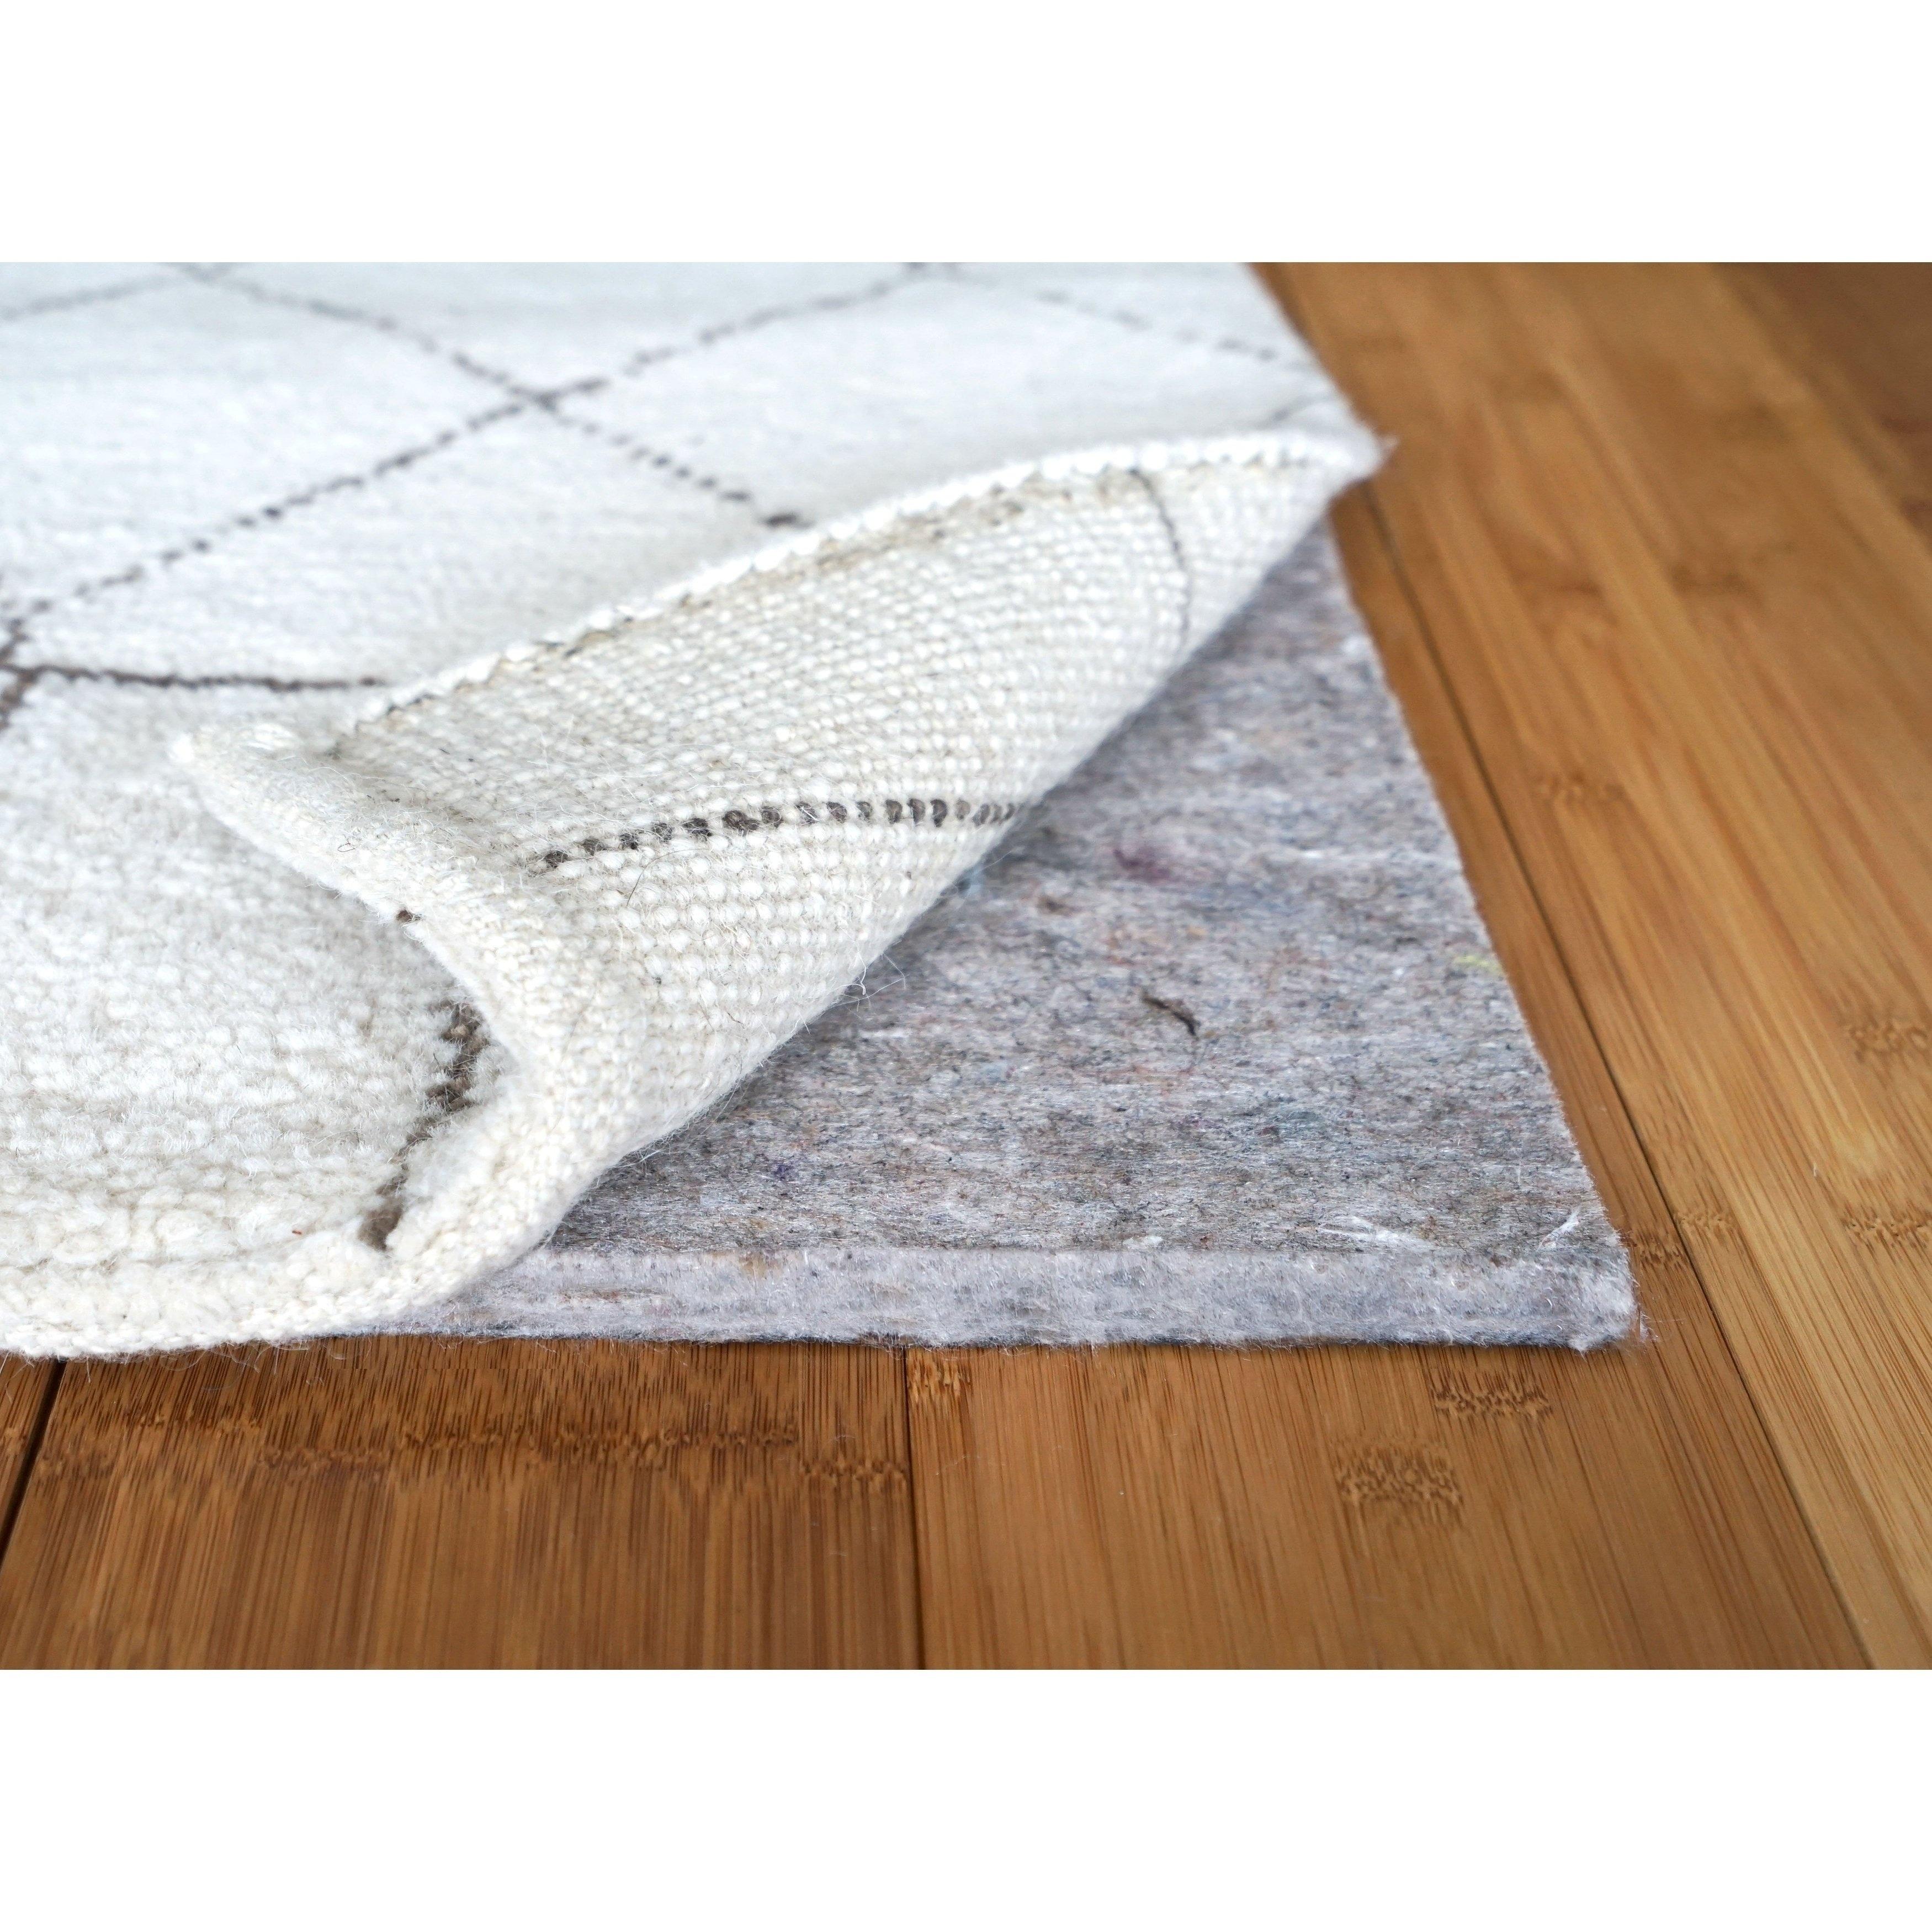 Shop 1 4 Inch Superior Felt Thin Rug Pad For Hardwood Floors Non